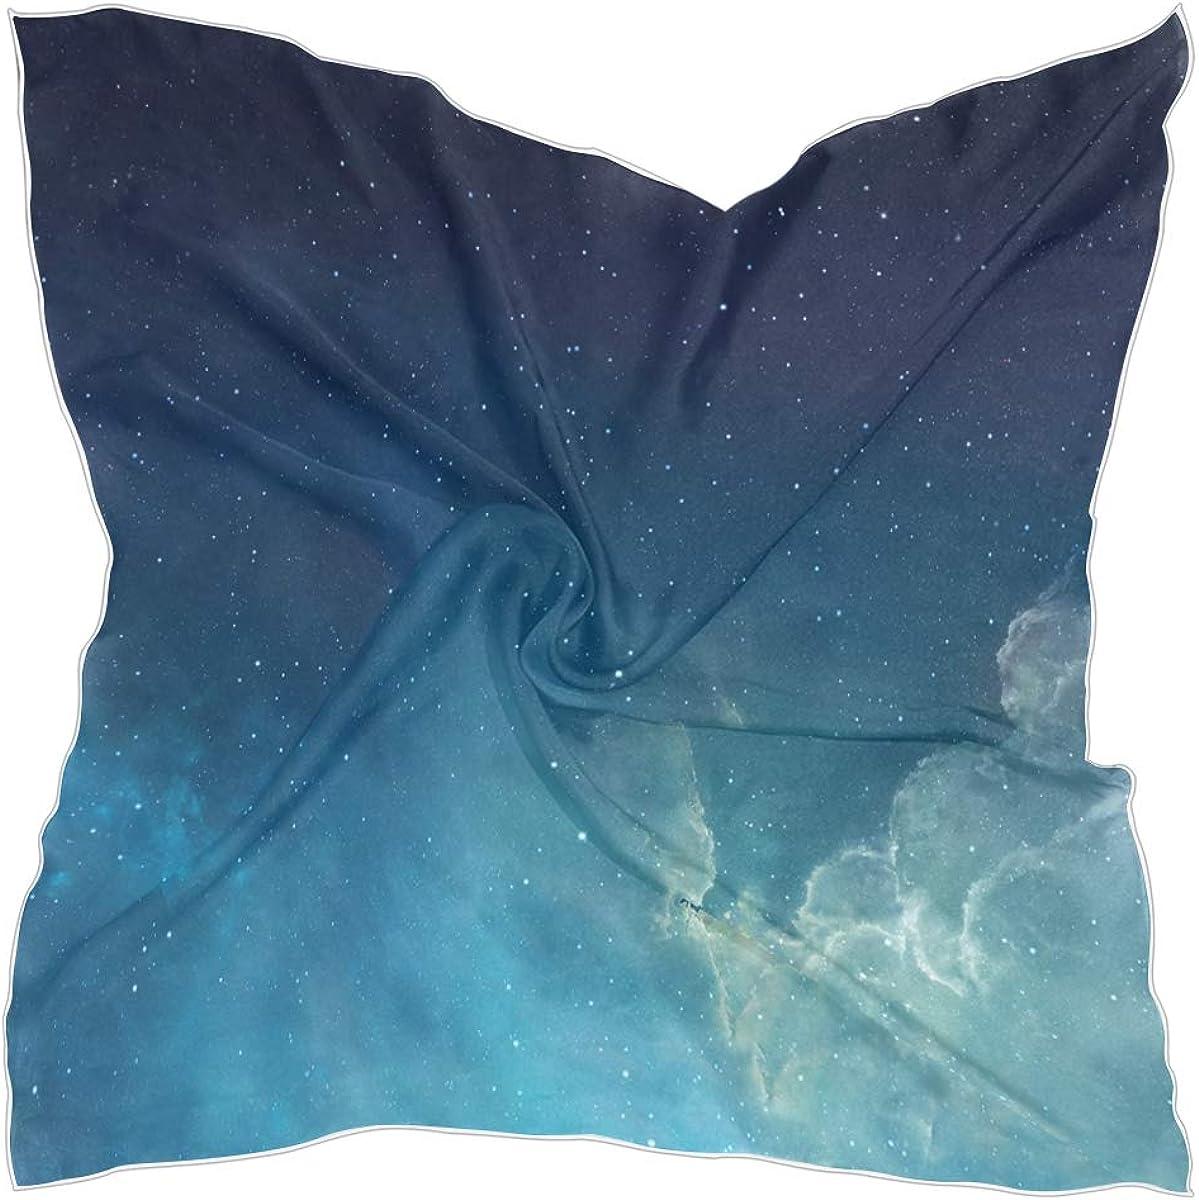 VOUSME Women Small Square Silk Feeling Satin Scarf Galaxy Nebula Pattern Mixed Designs Fashion Pattern Neck Head Scarf Scarves Bundle 23 x 23 Inches